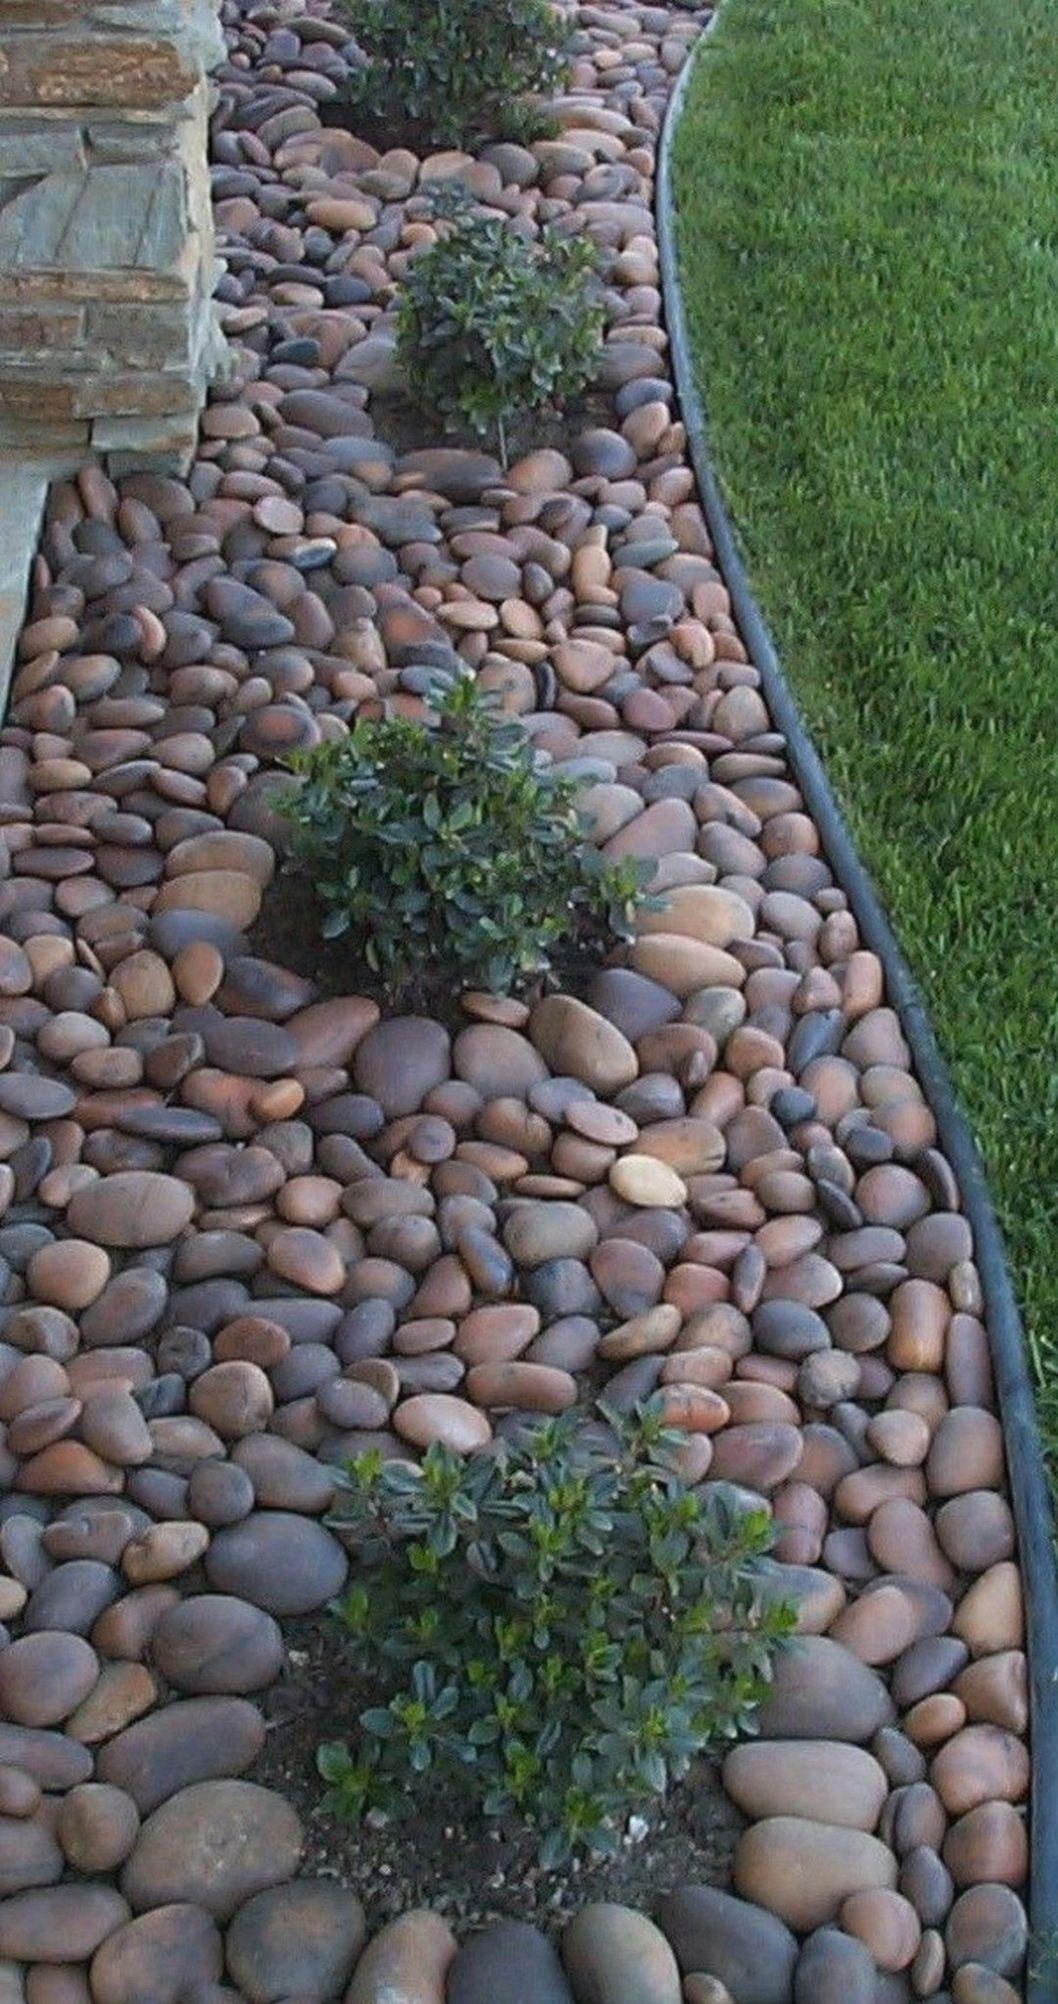 front yard landscaping ideas queensland  Rock garden landscaping